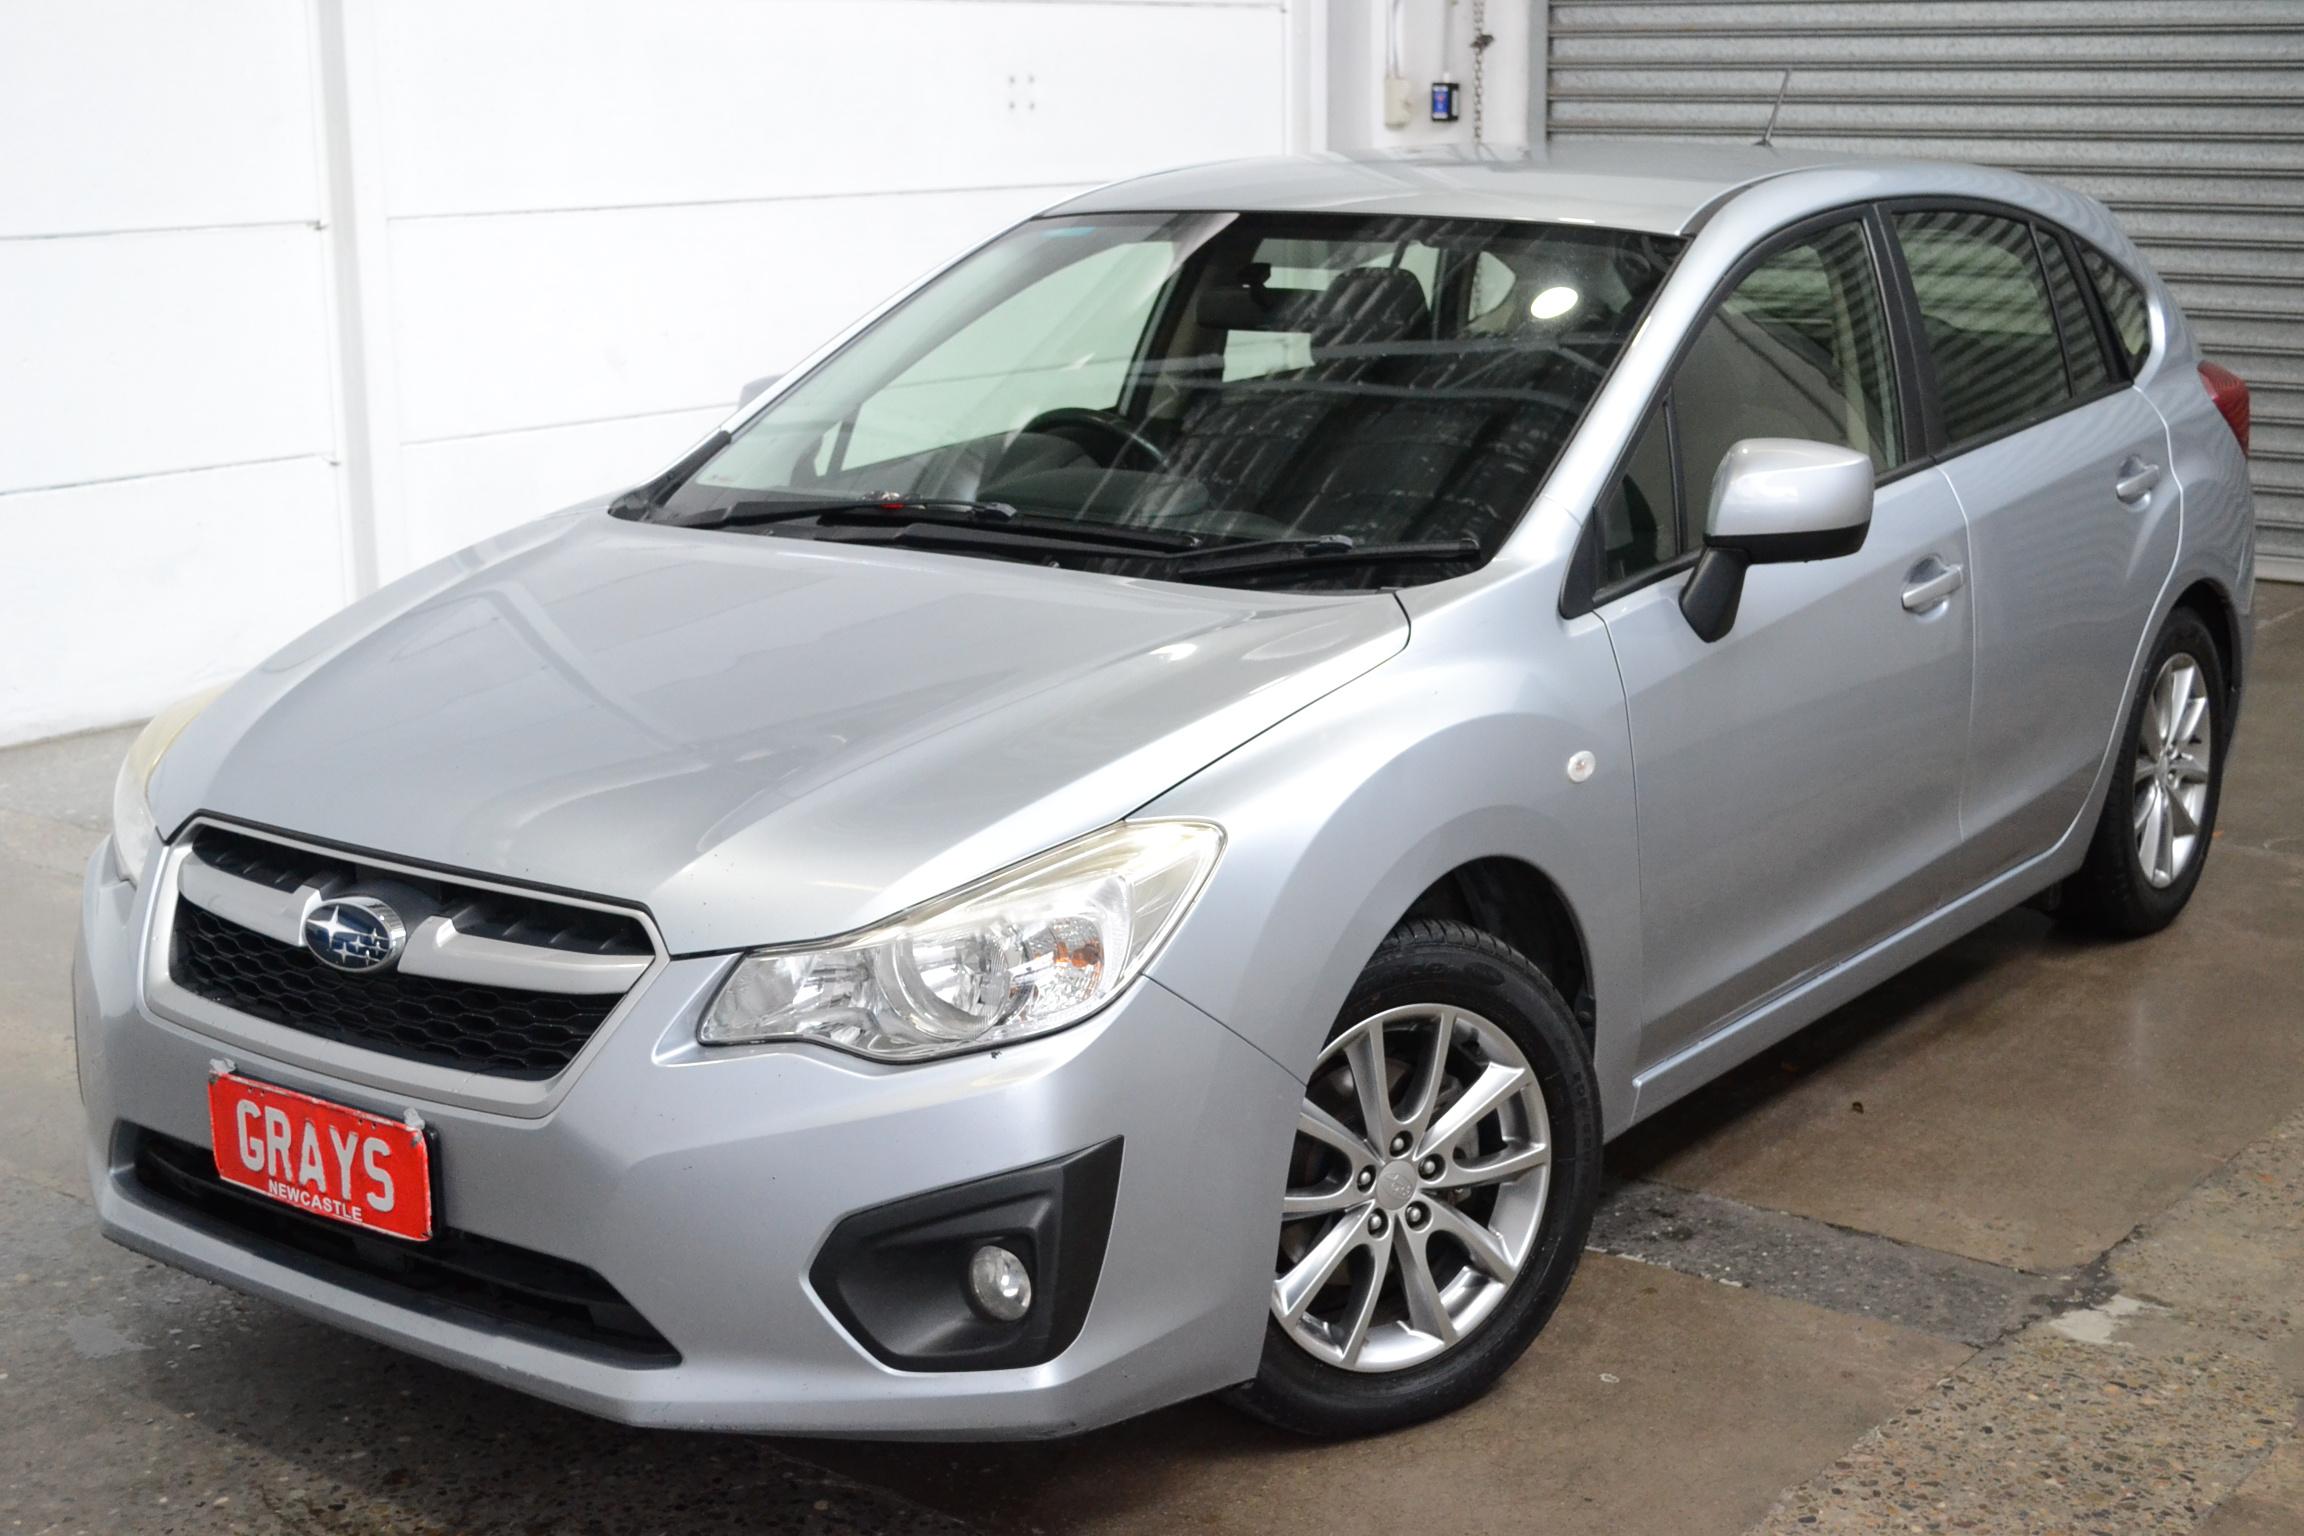 2014 Subaru Impreza 2.0i (AWD) G4 CVT Hatchback